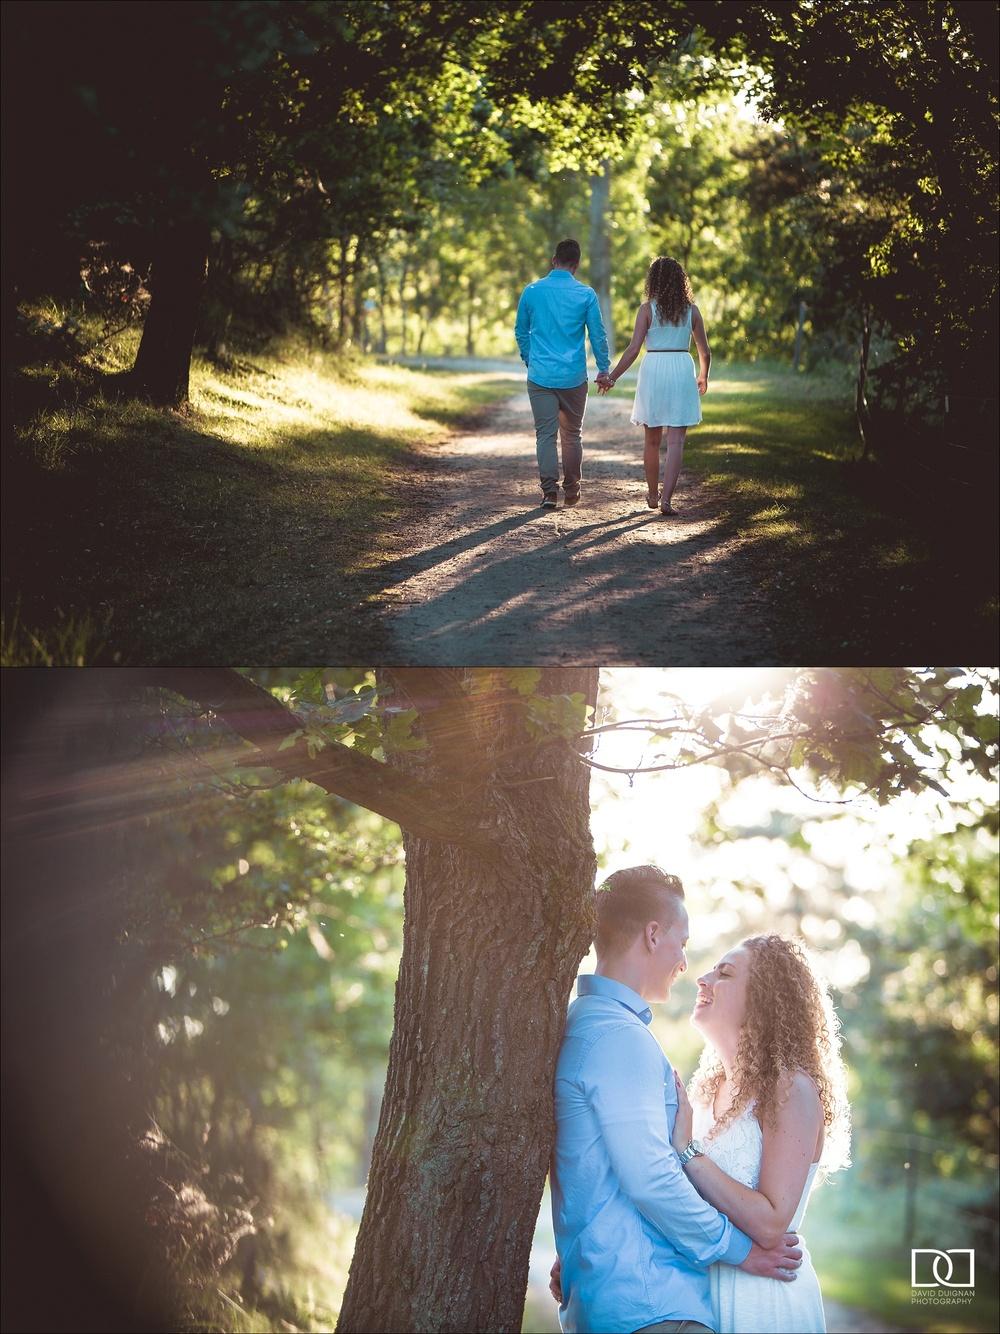 dublin_wedding_photographer_david_duignan_photography_engagement_shoot_Ireland_0007.jpg